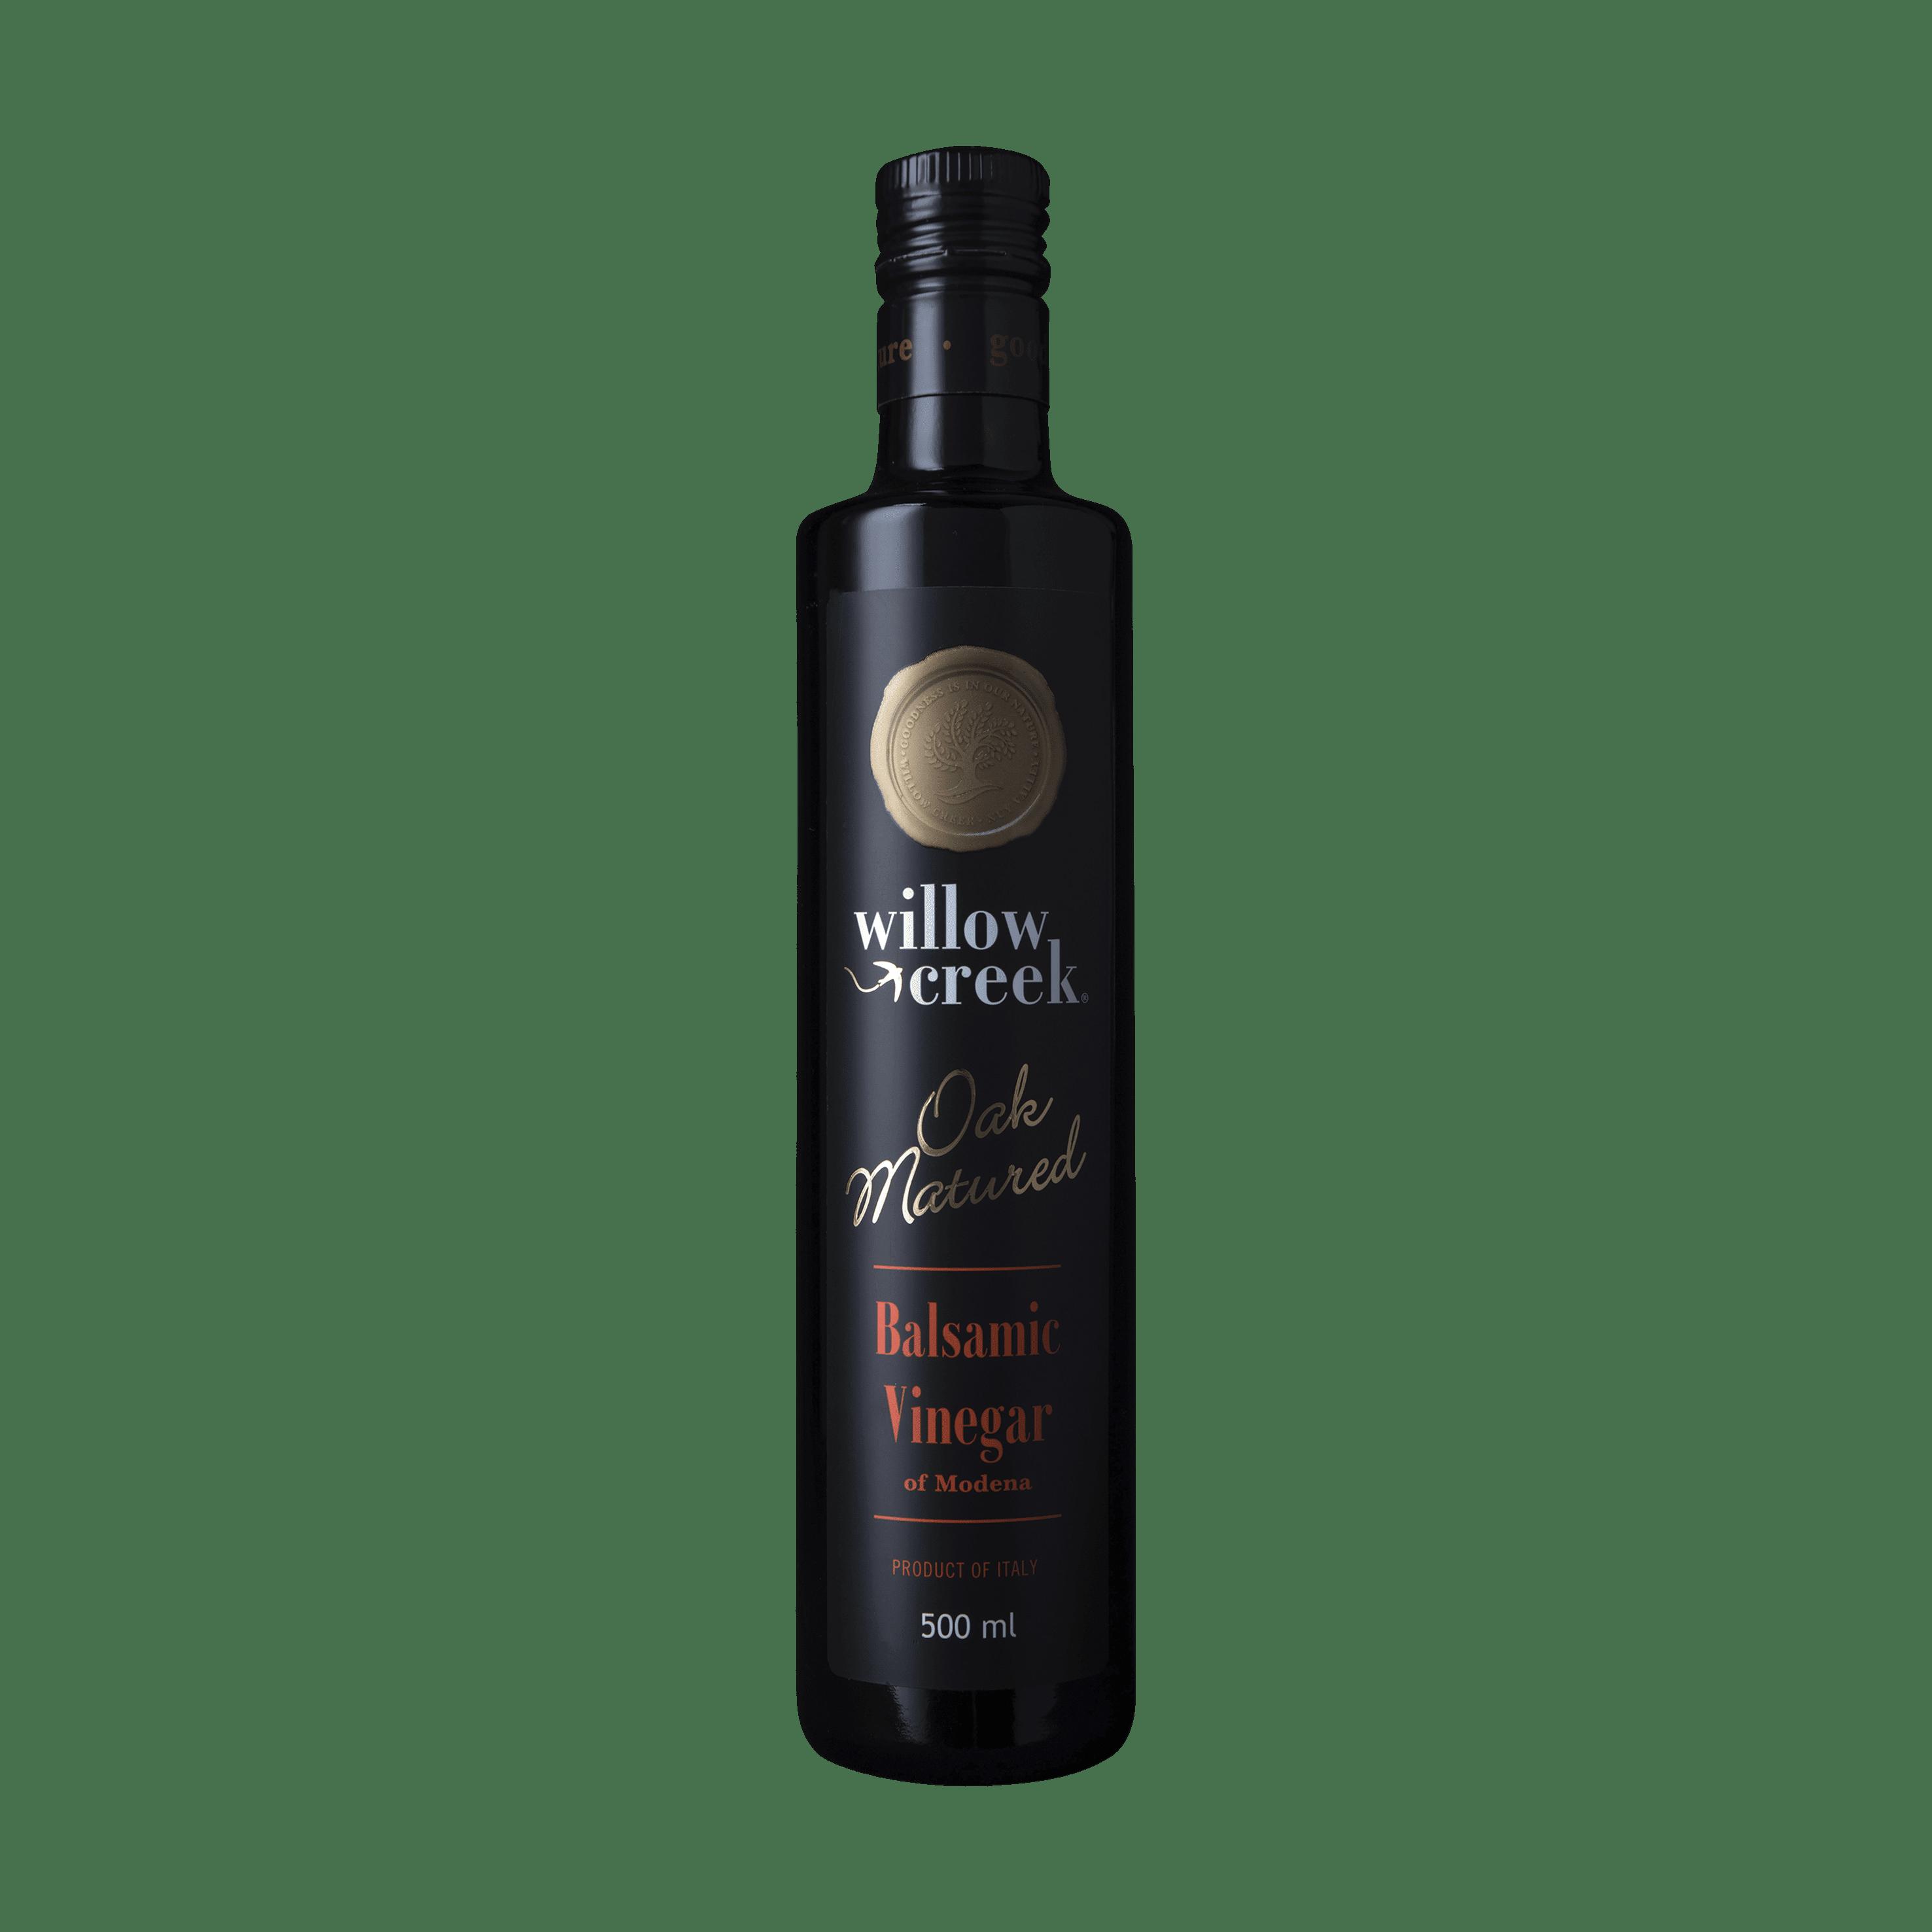 Balsamic Vinegar of Modena Italy